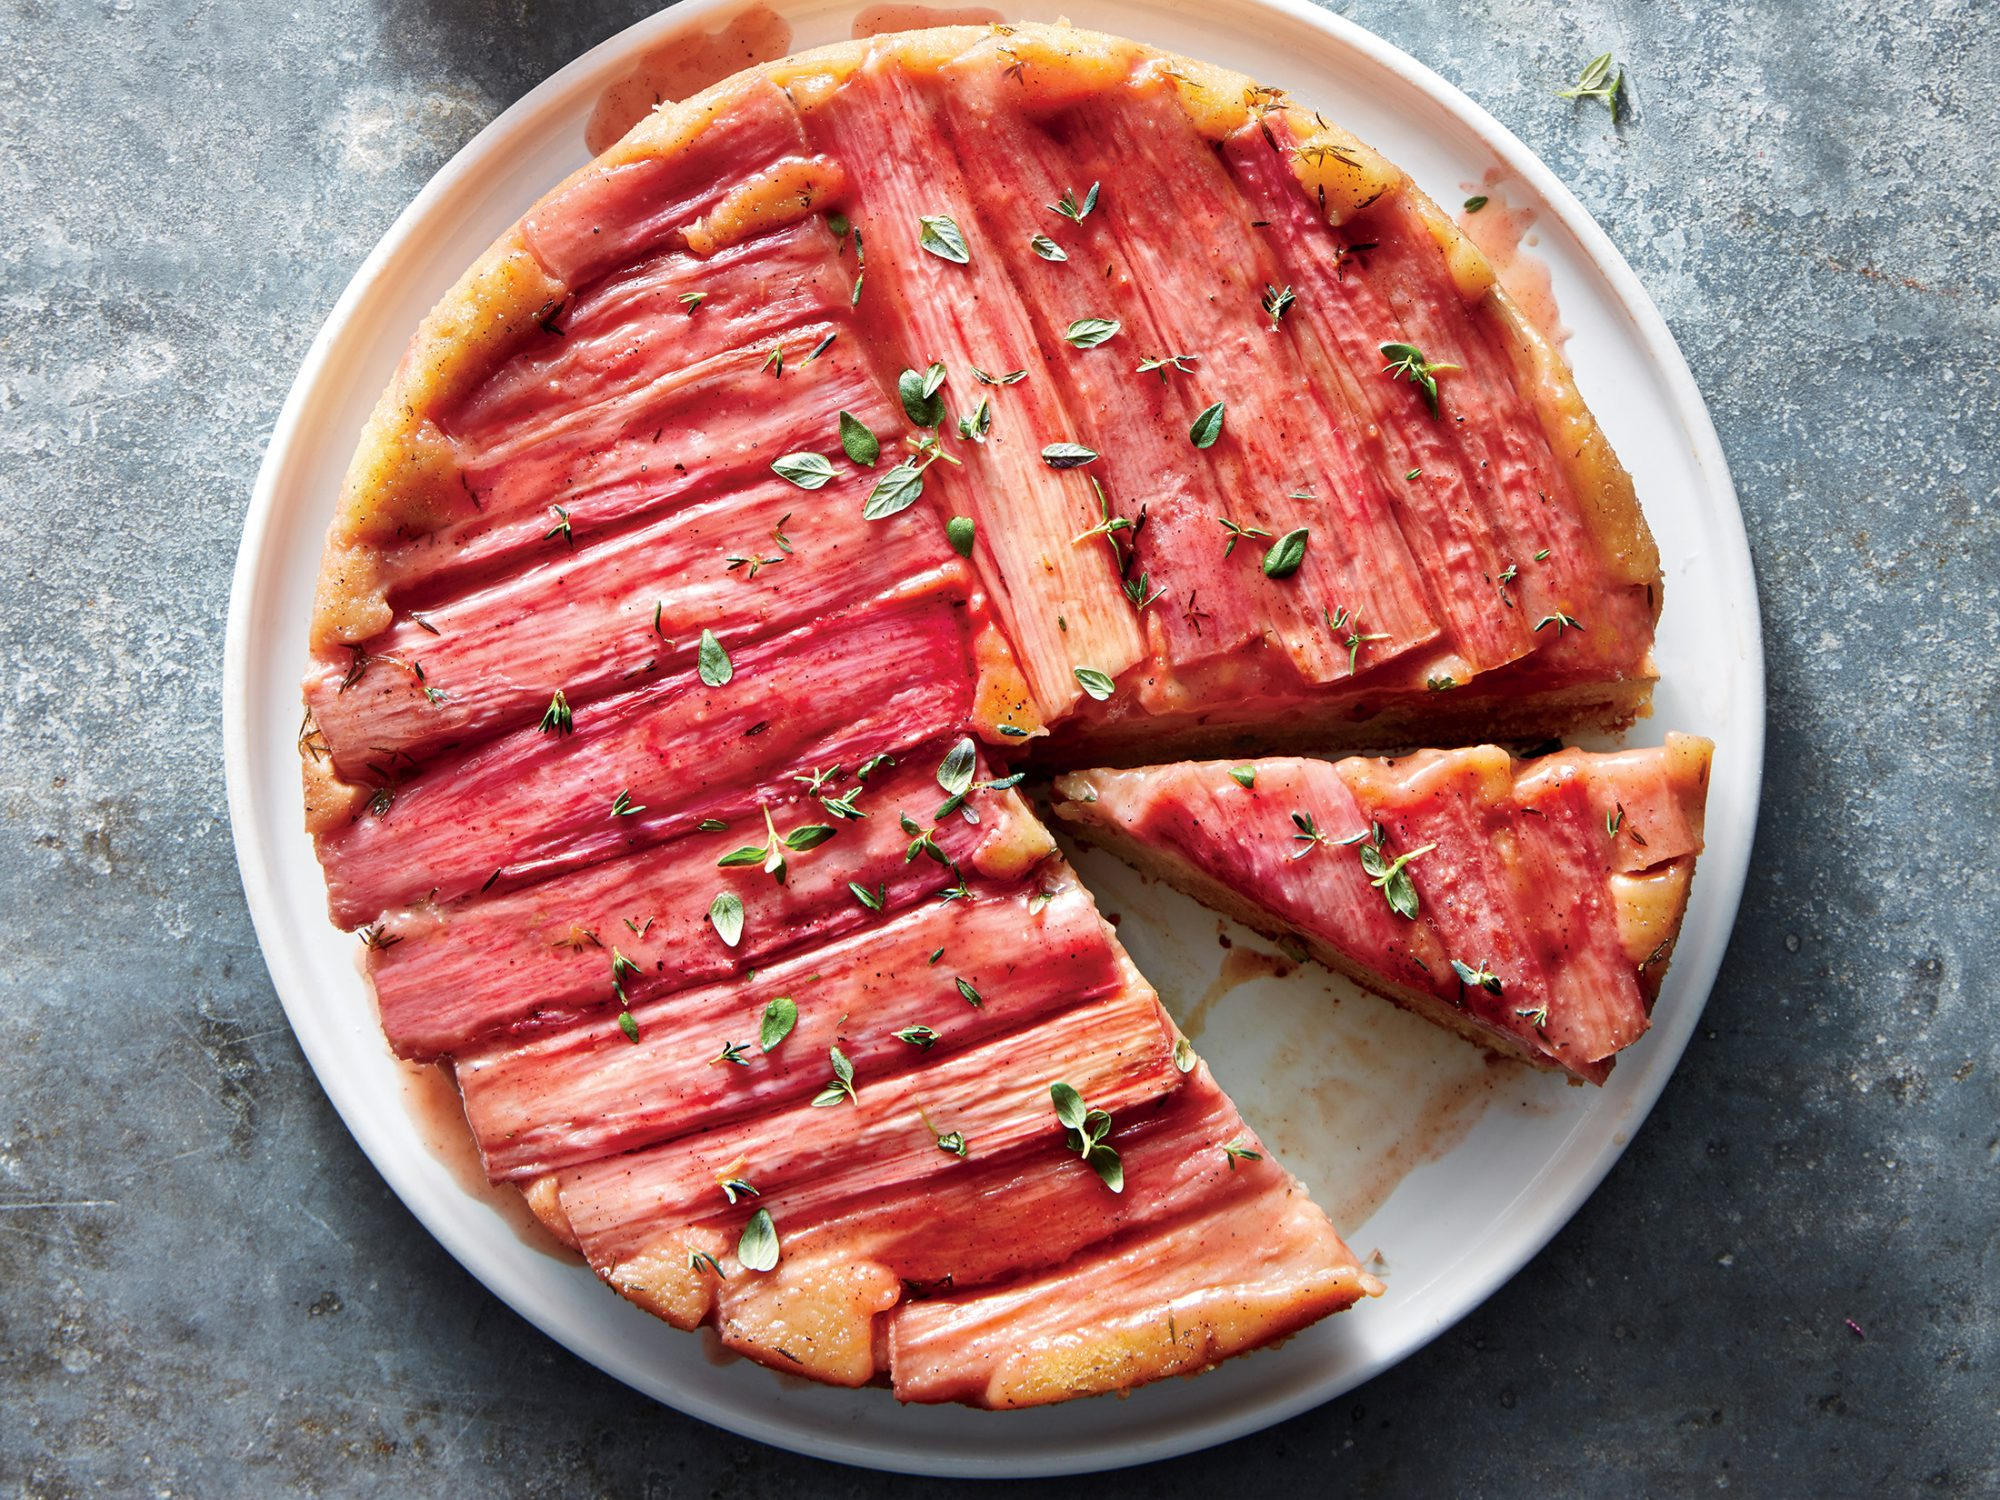 ck-Rhubarb Upside-Down Cake